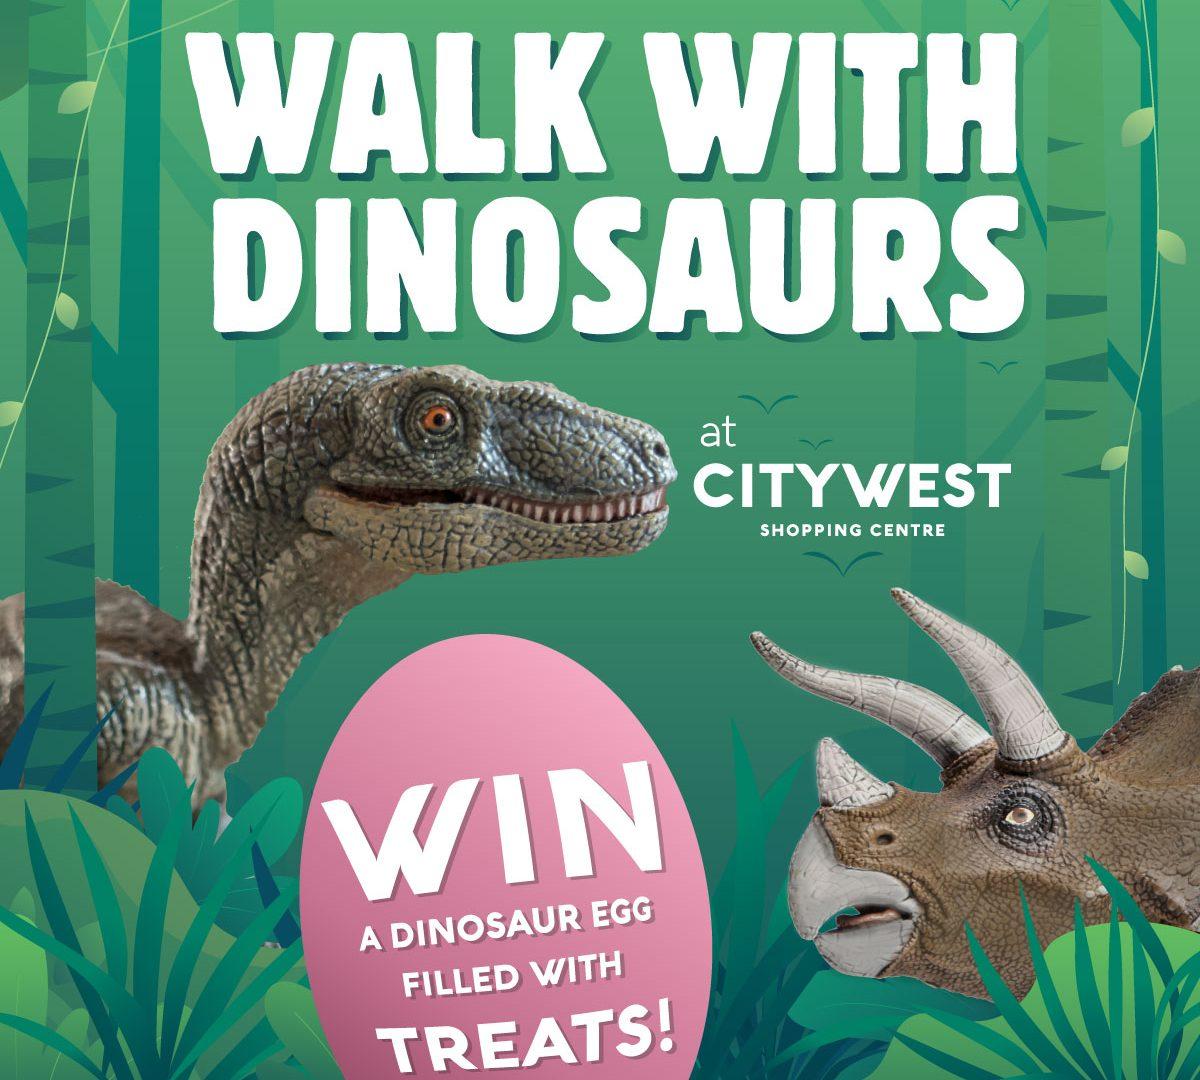 6312 Citywest Dino promo post 2